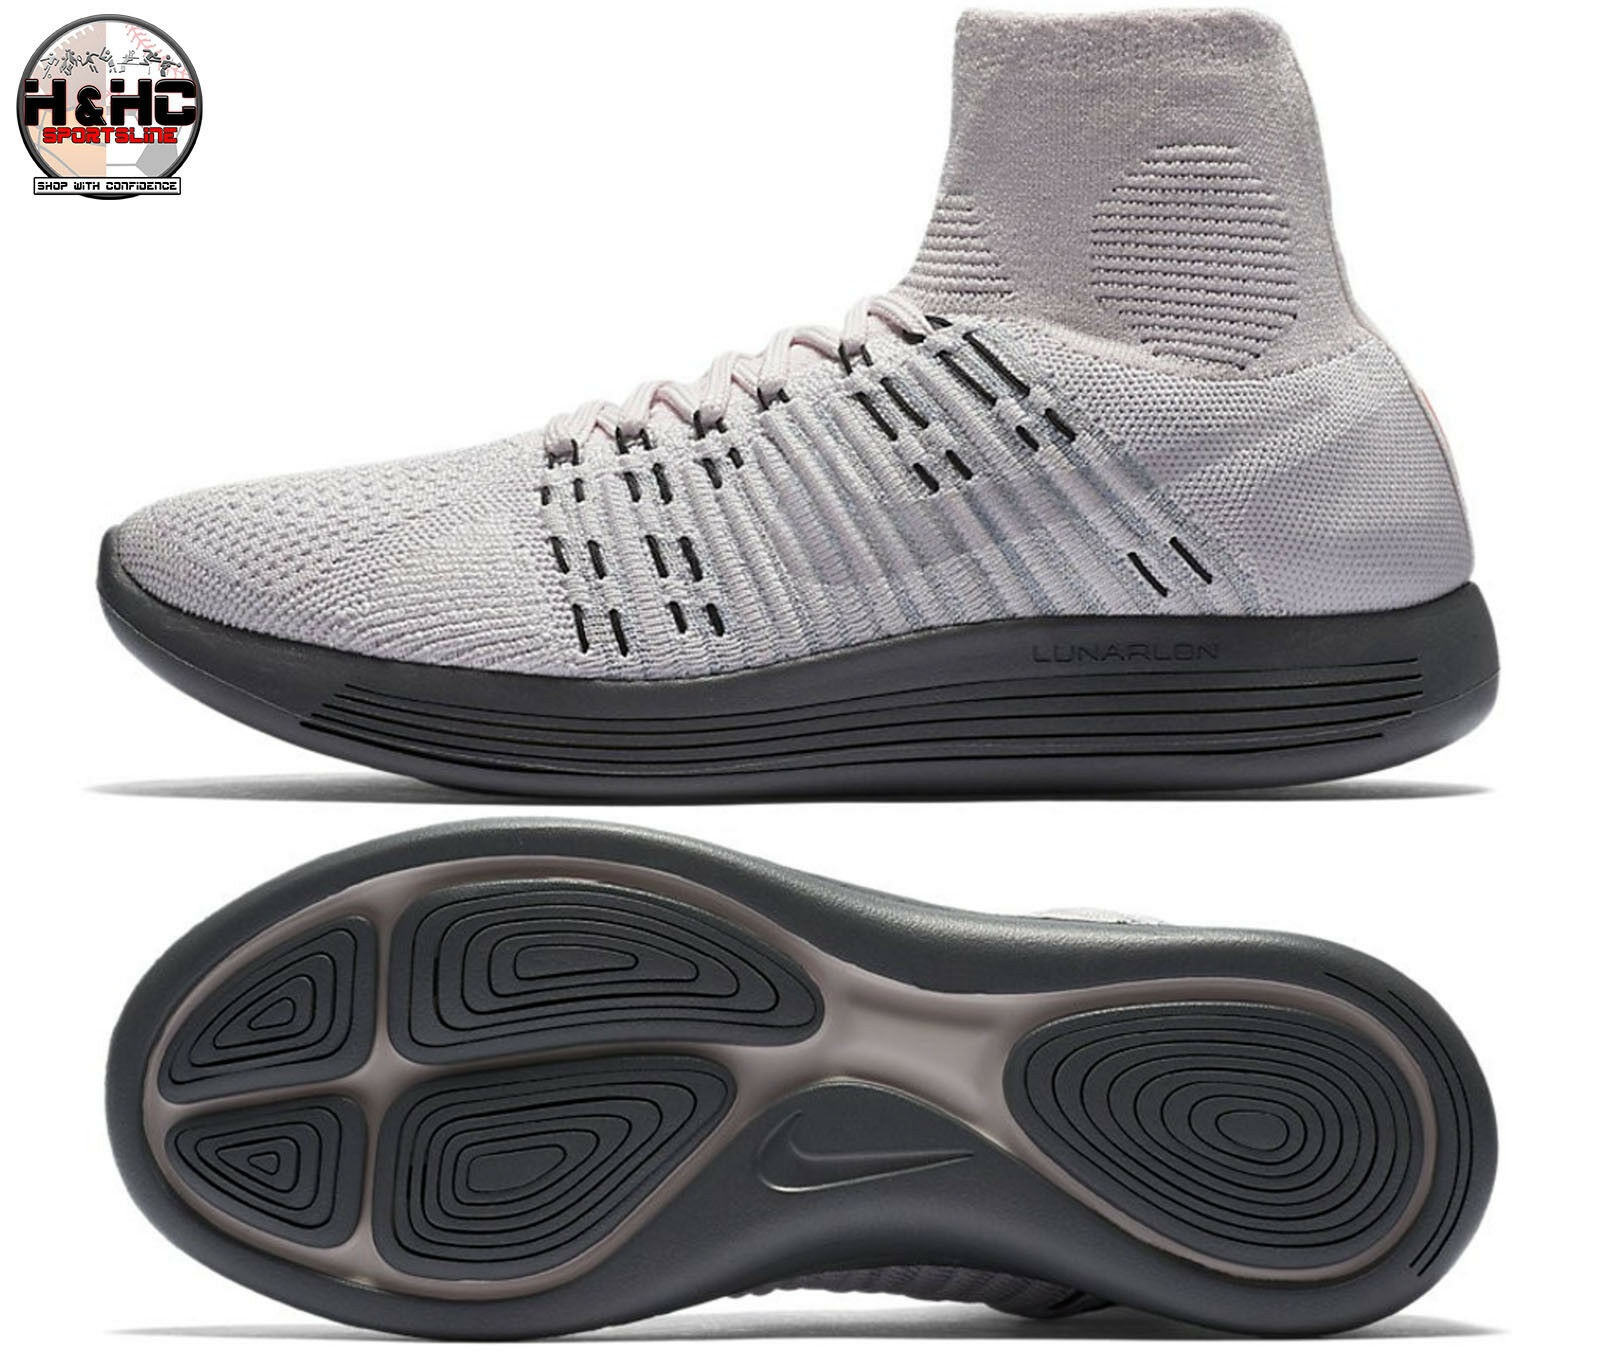 NikeLab Lunarepic Flyknit 831112 600 Pearl Pink Women's Running shoes Sz 8.5